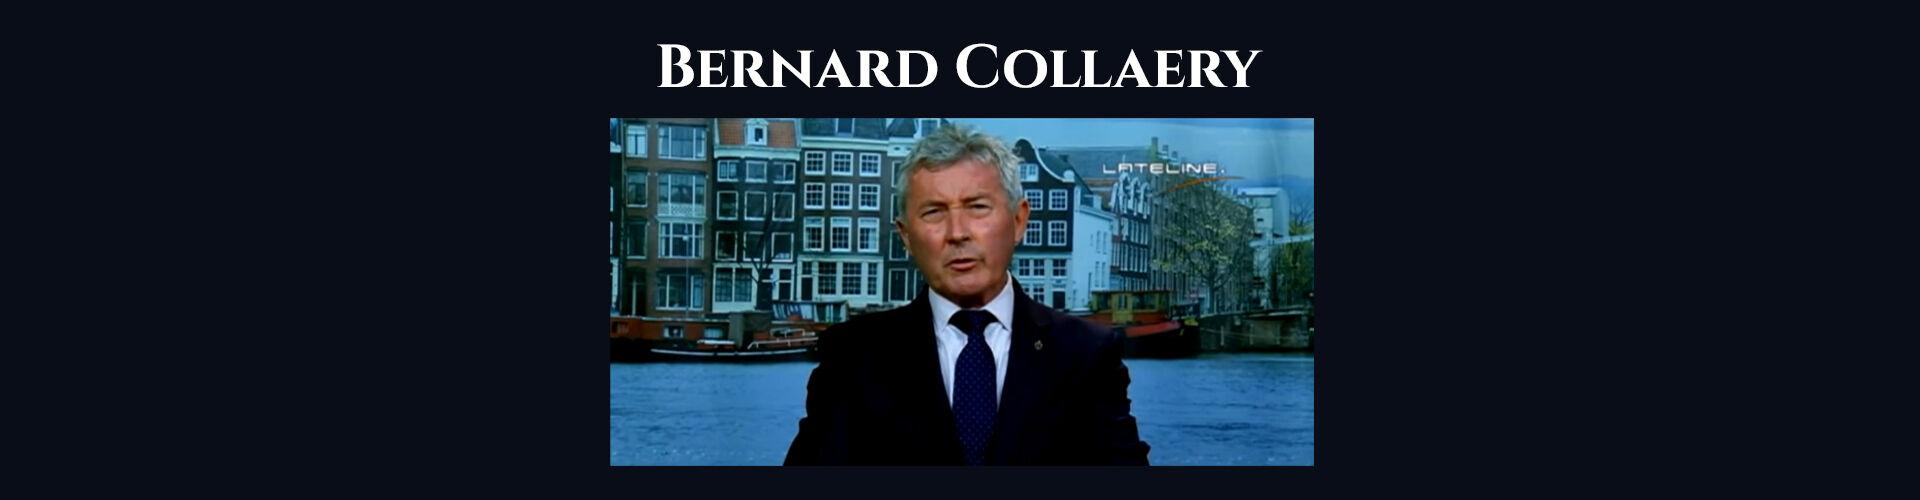 Absent Justice - Bernard Collaery